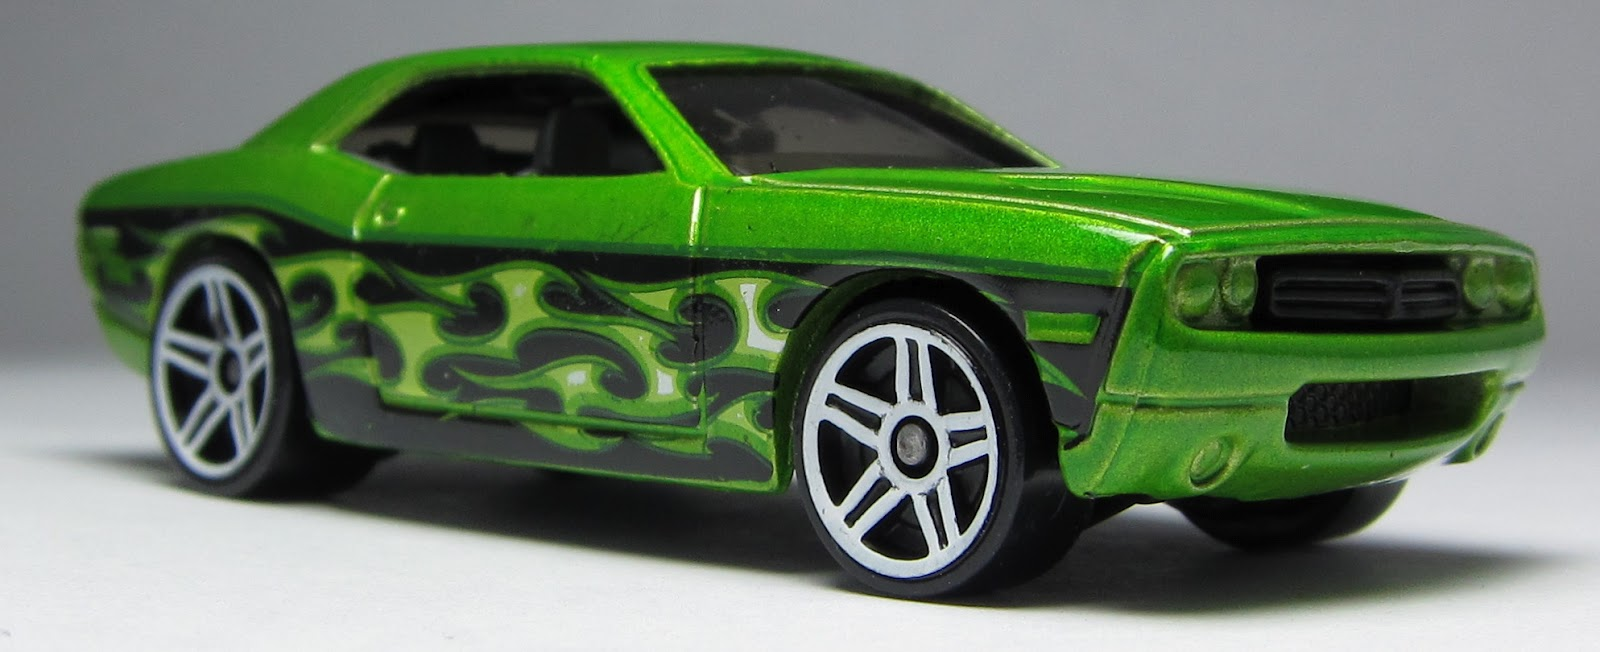 First Look Hot Wheels Heat Fleet Dodge Challenger Concept